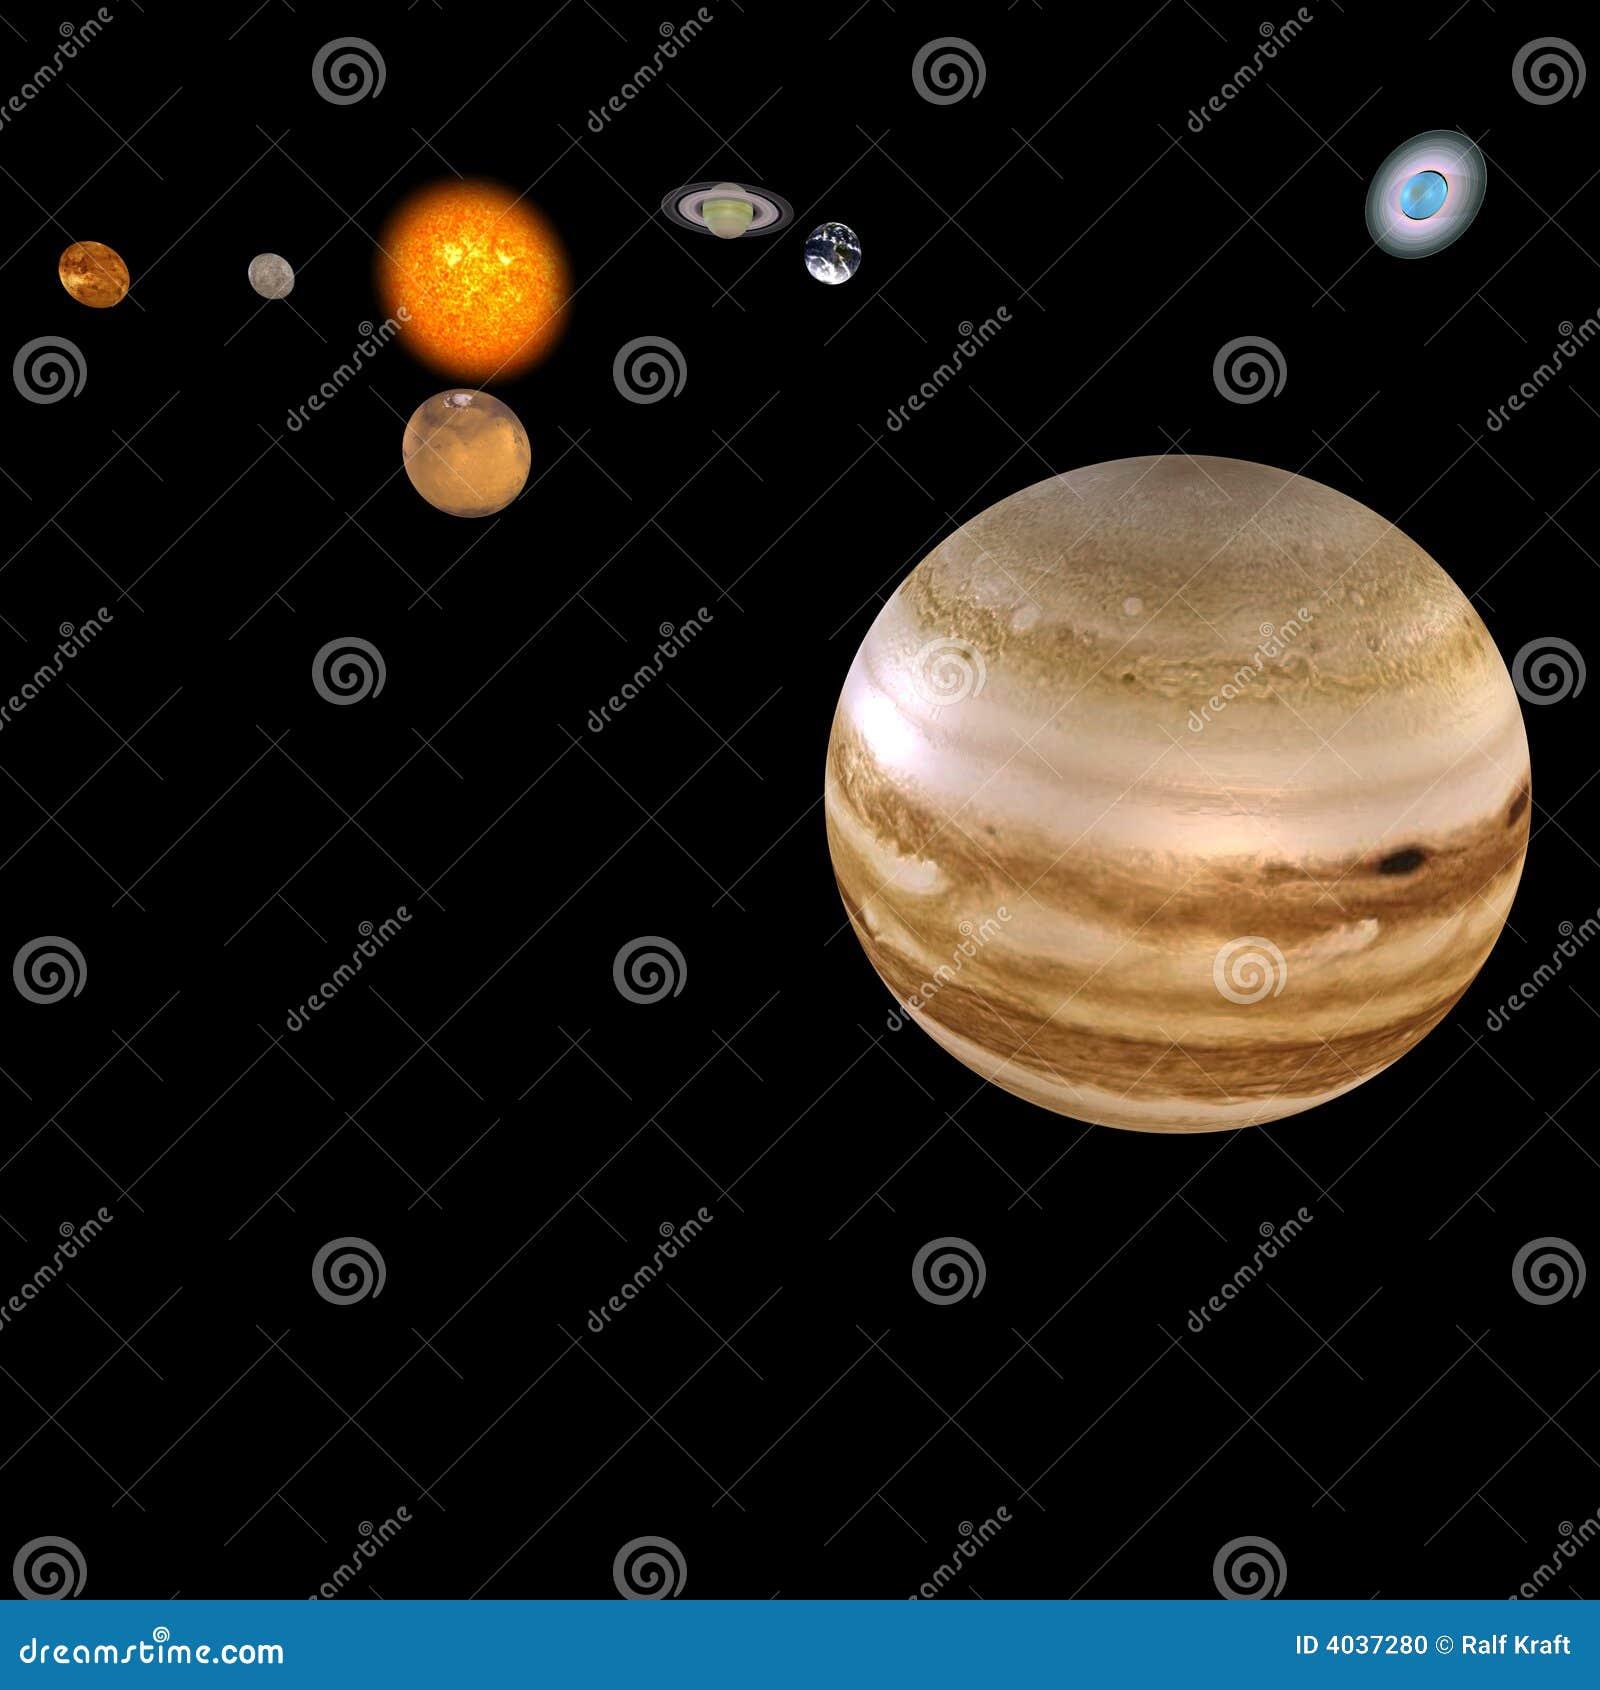 solar system jupiter - photo #40